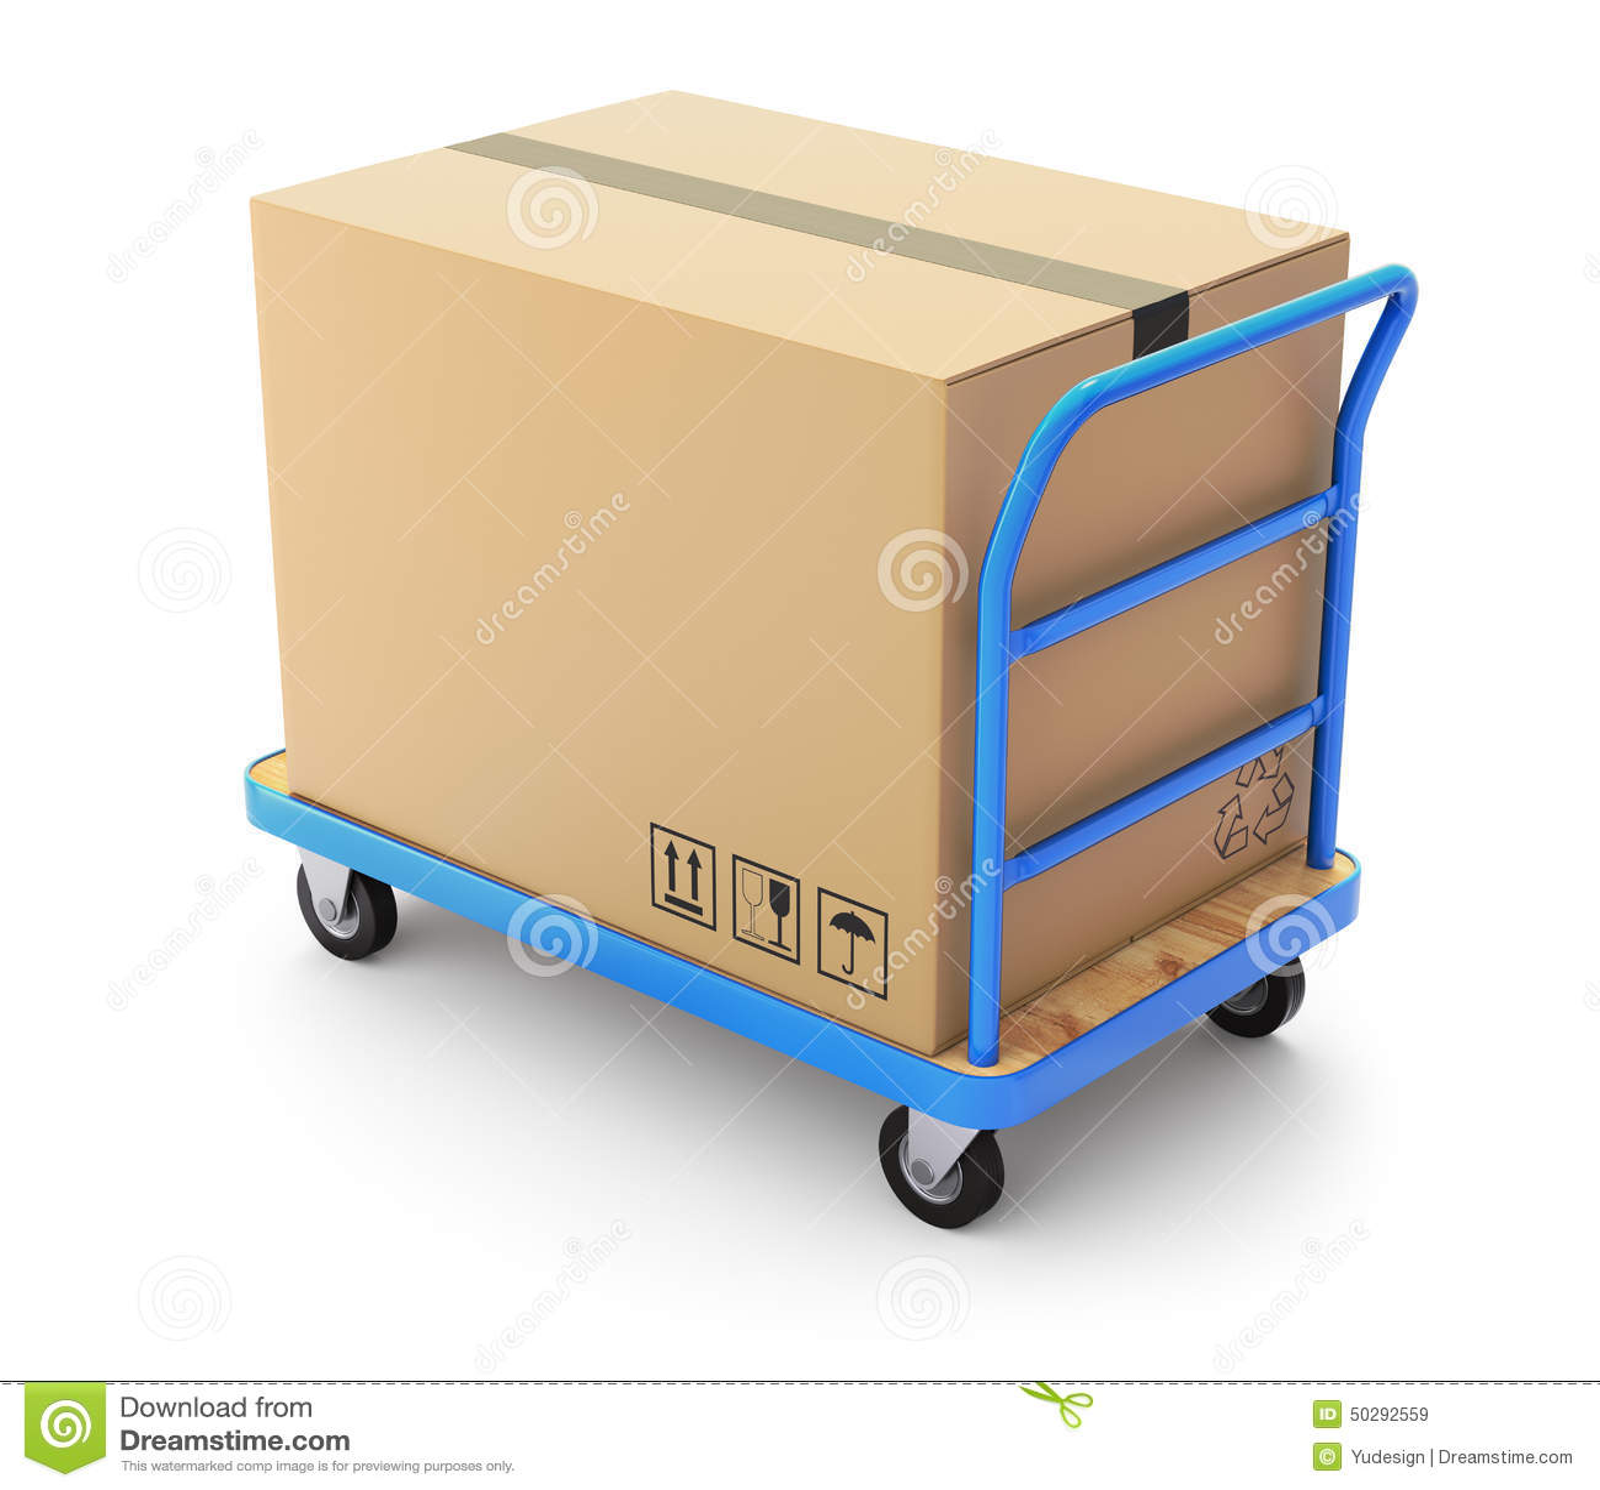 trolley with box stock illustration image 50292559. Black Bedroom Furniture Sets. Home Design Ideas